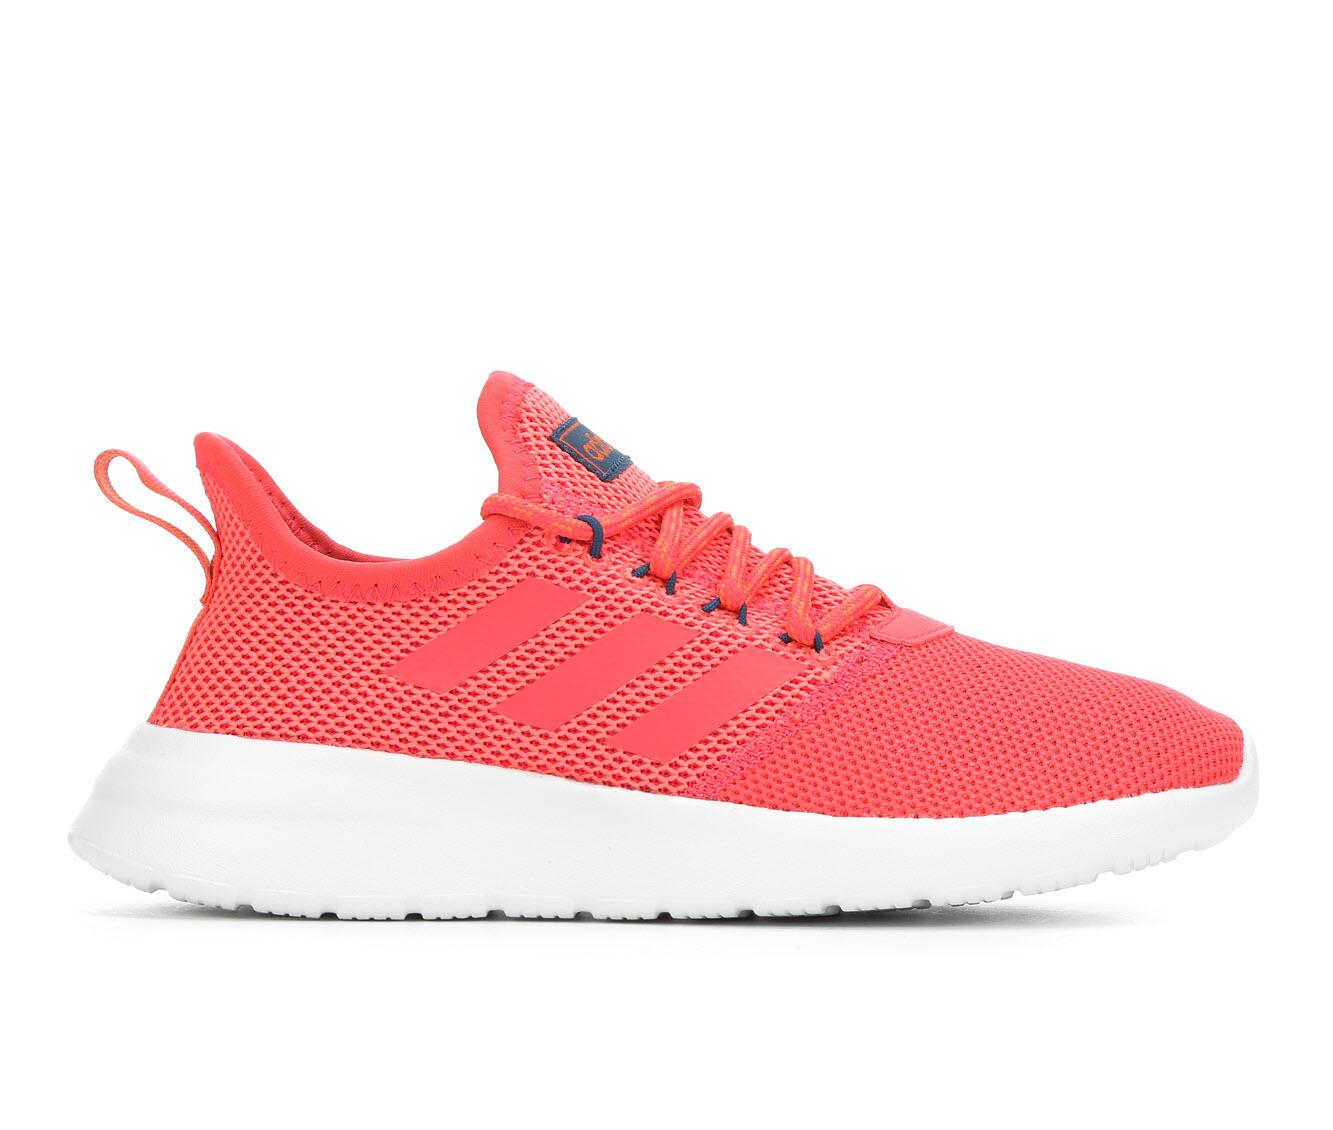 Women's Adidas Lite Racer Reborn Sneakers Red/Orange/Wht